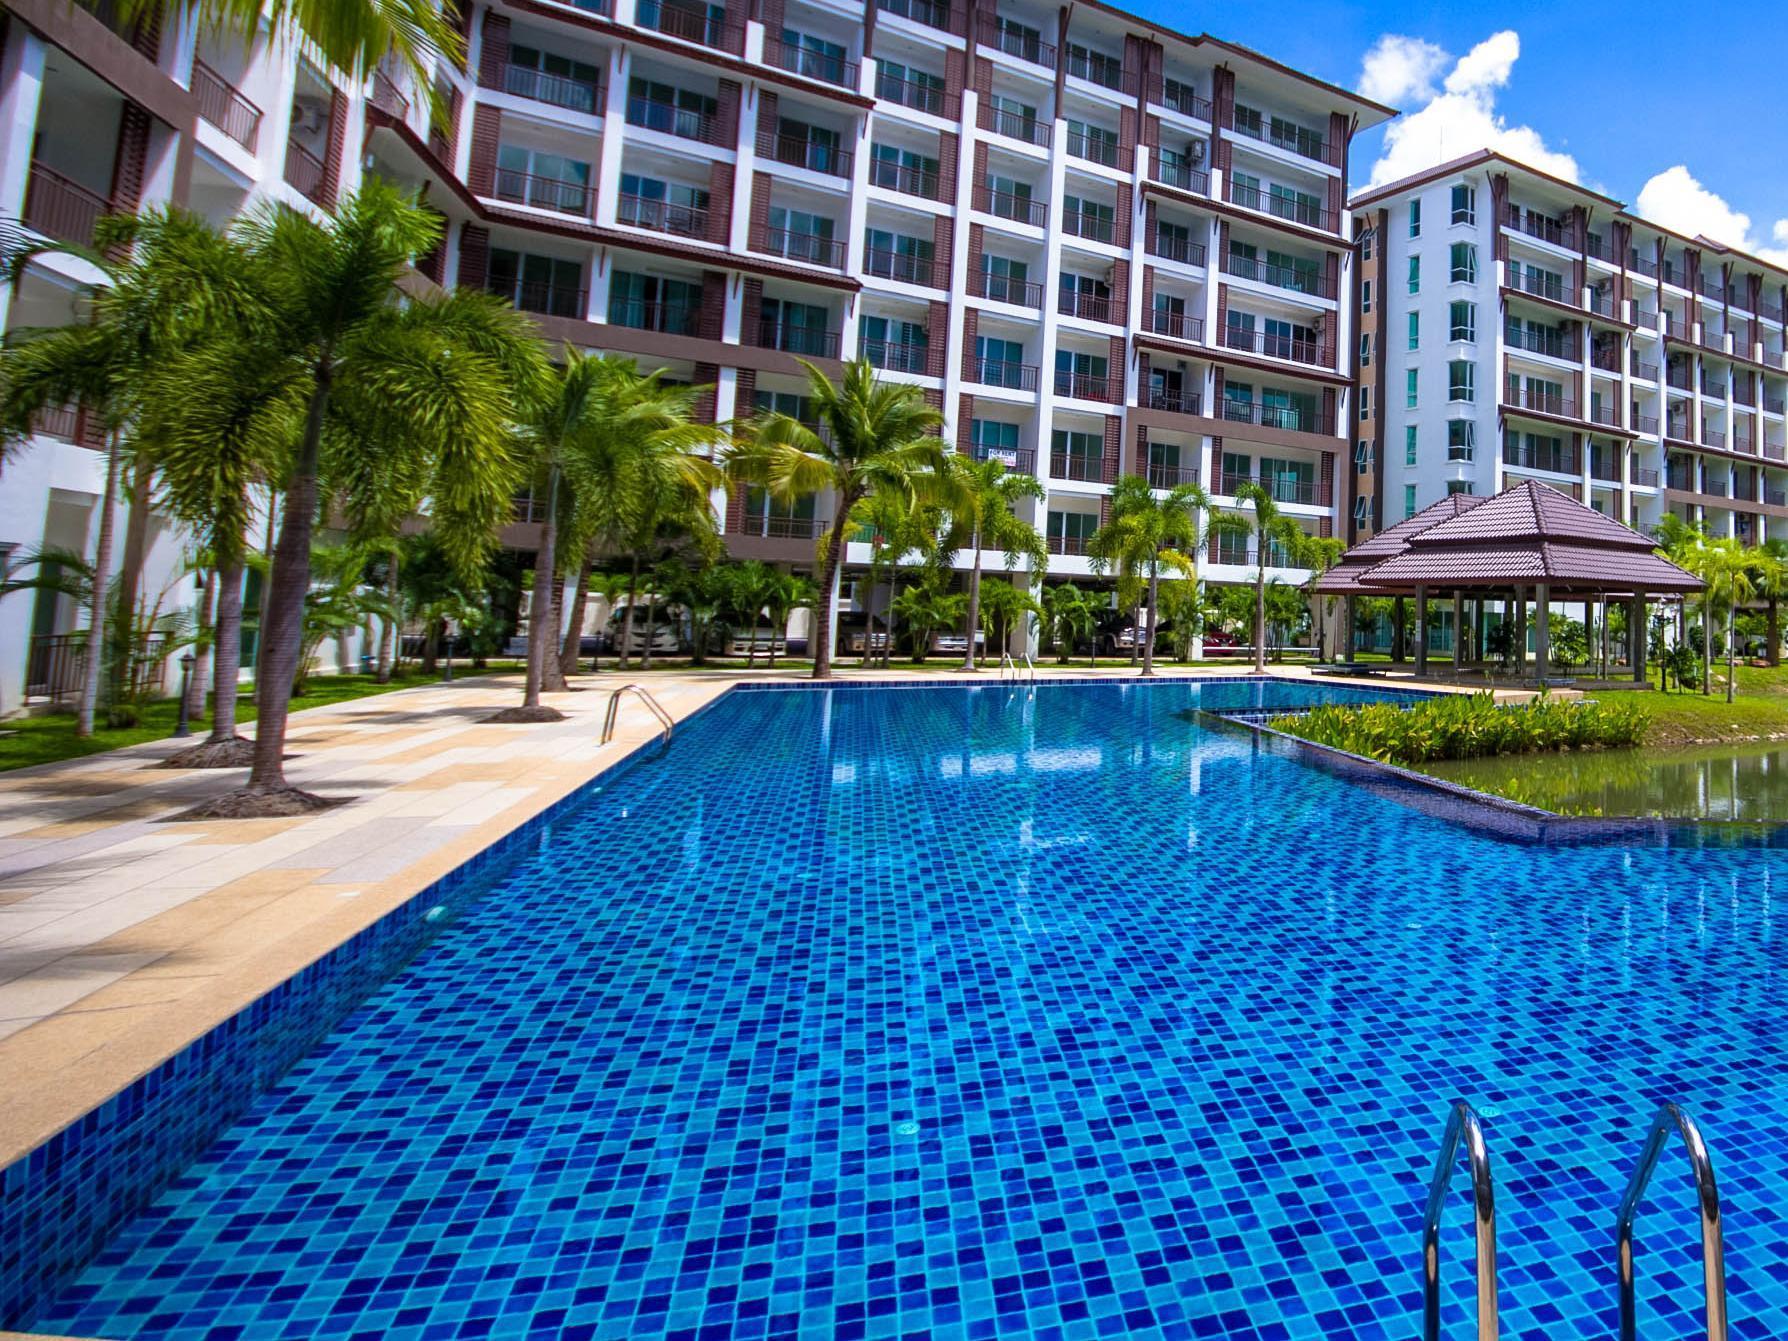 AD Studio Bang Saray Lake and Resort B330 - Hotels and Accommodation in Thailand, Asia